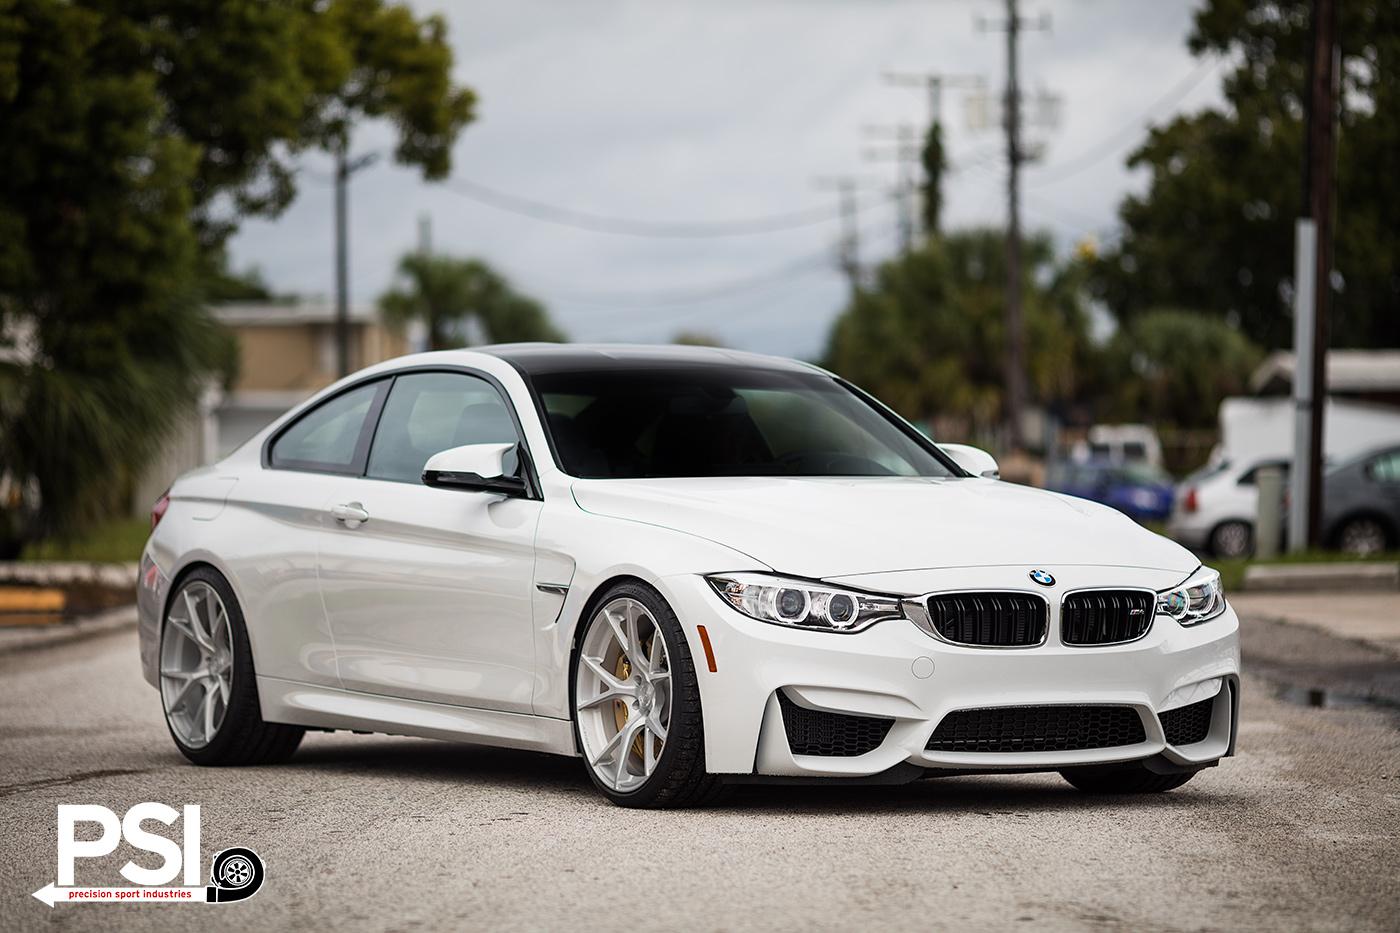 BMW F82 M4 by PSI Velos KW Suspension9